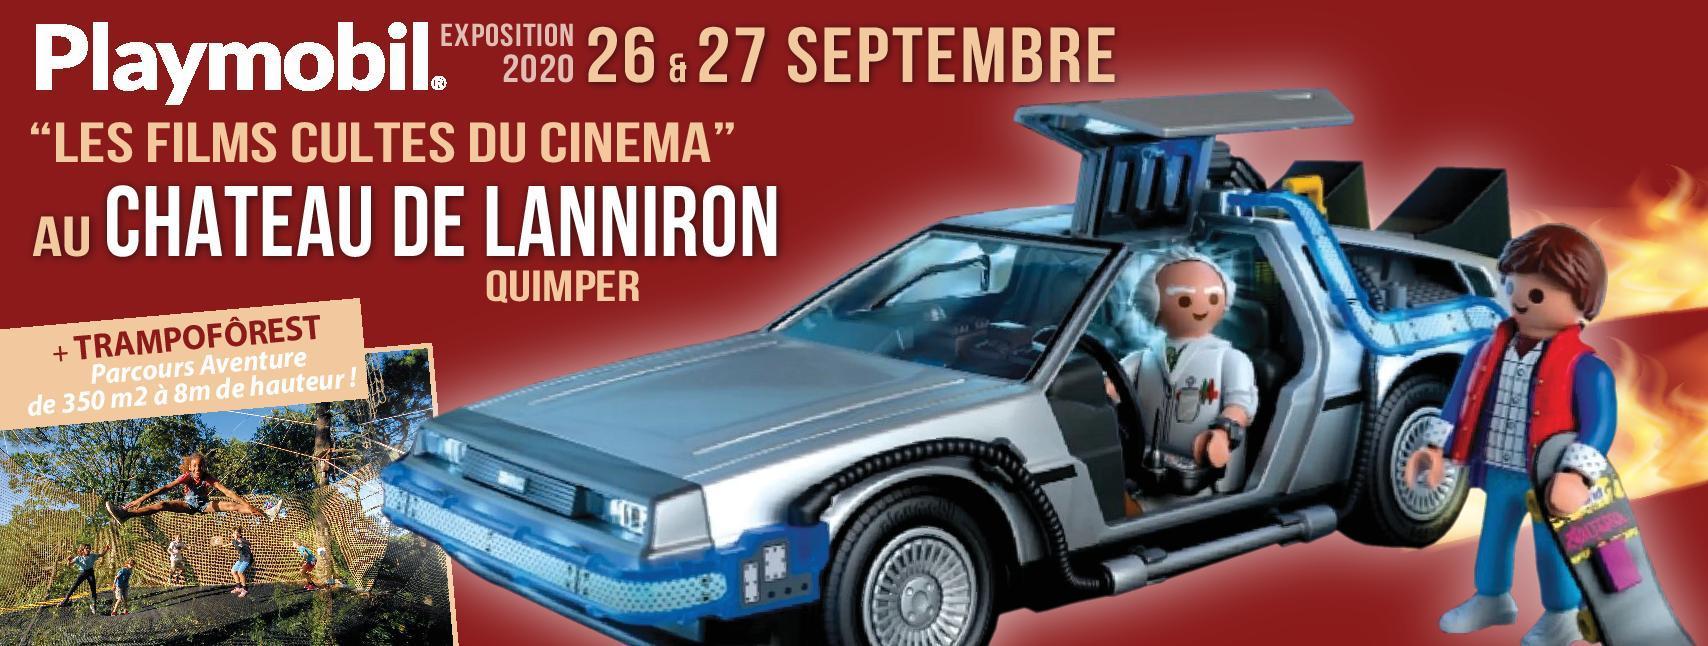 Exposition playmobil lanniron quimper 2020